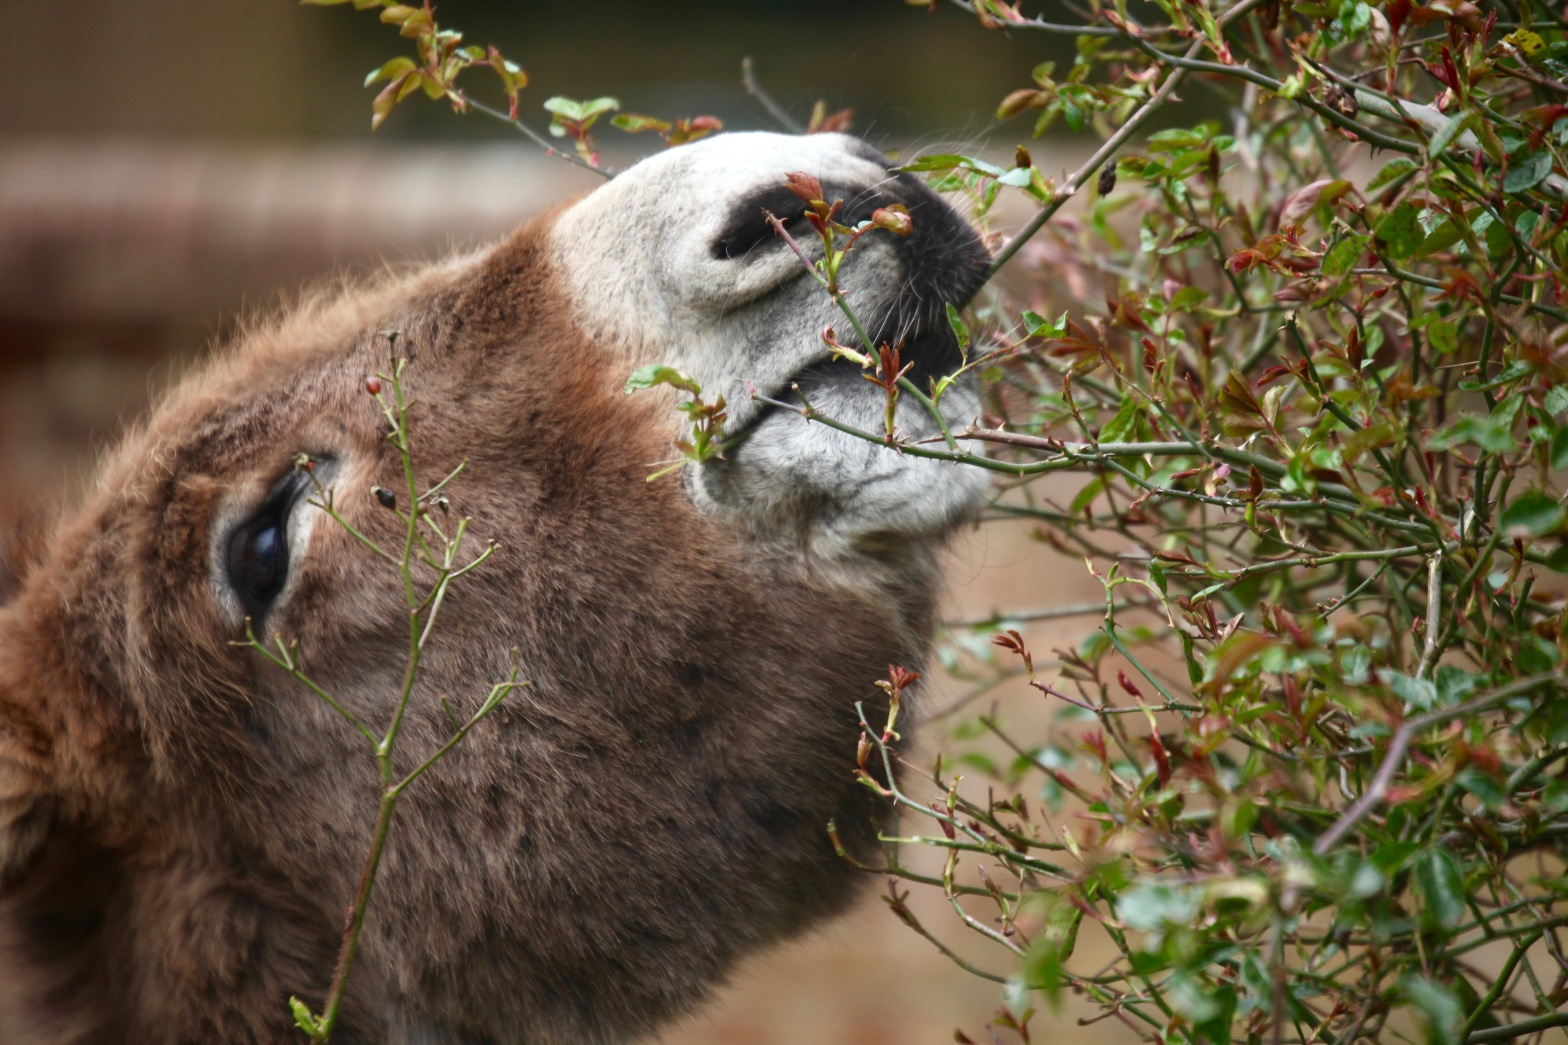 Donkey in garden 8